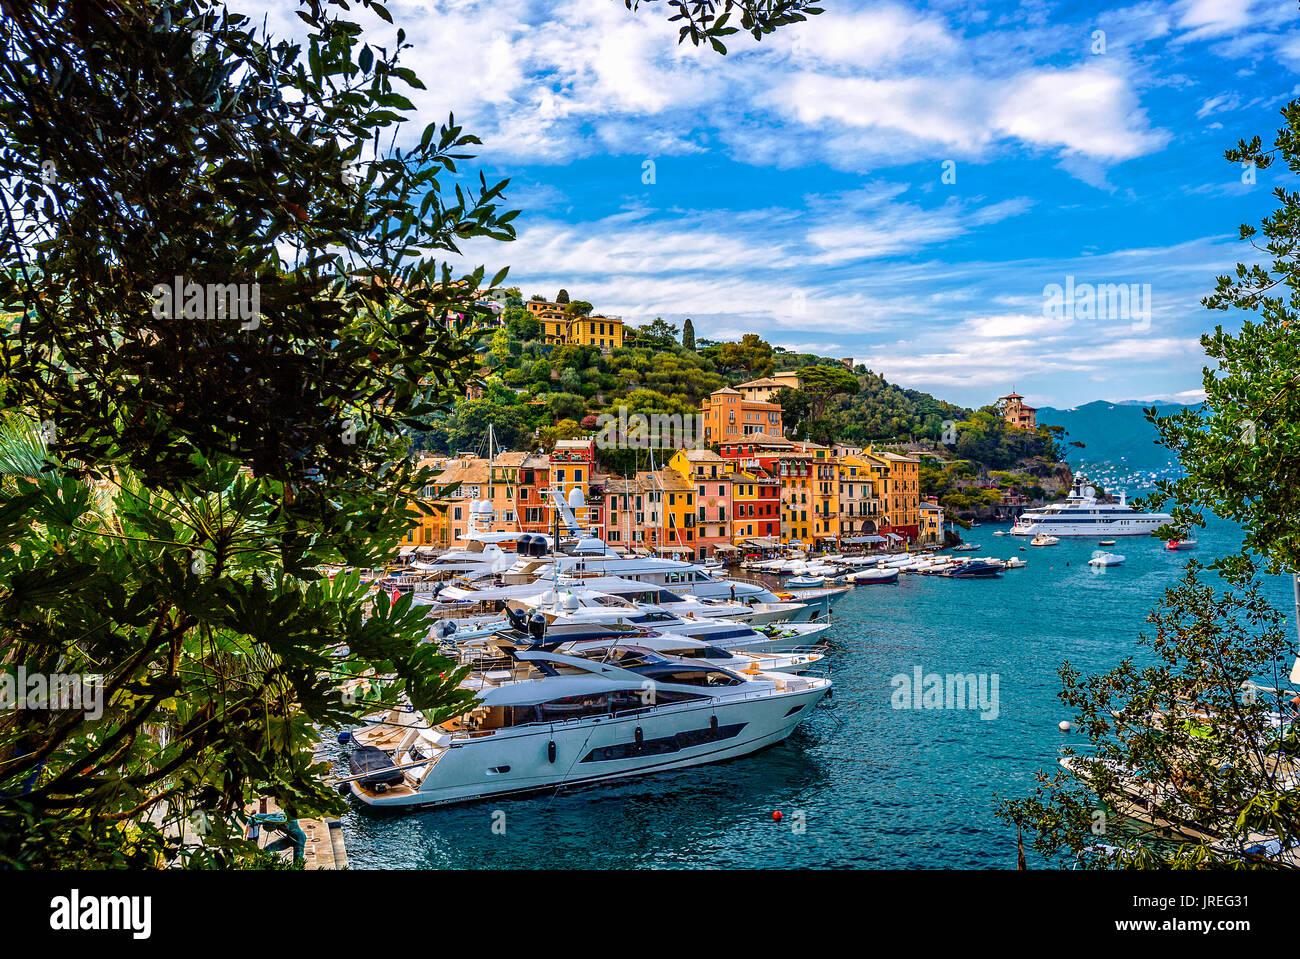 Italy Liguria Mount of Portofino Park - Portofino Bay - Stock Image